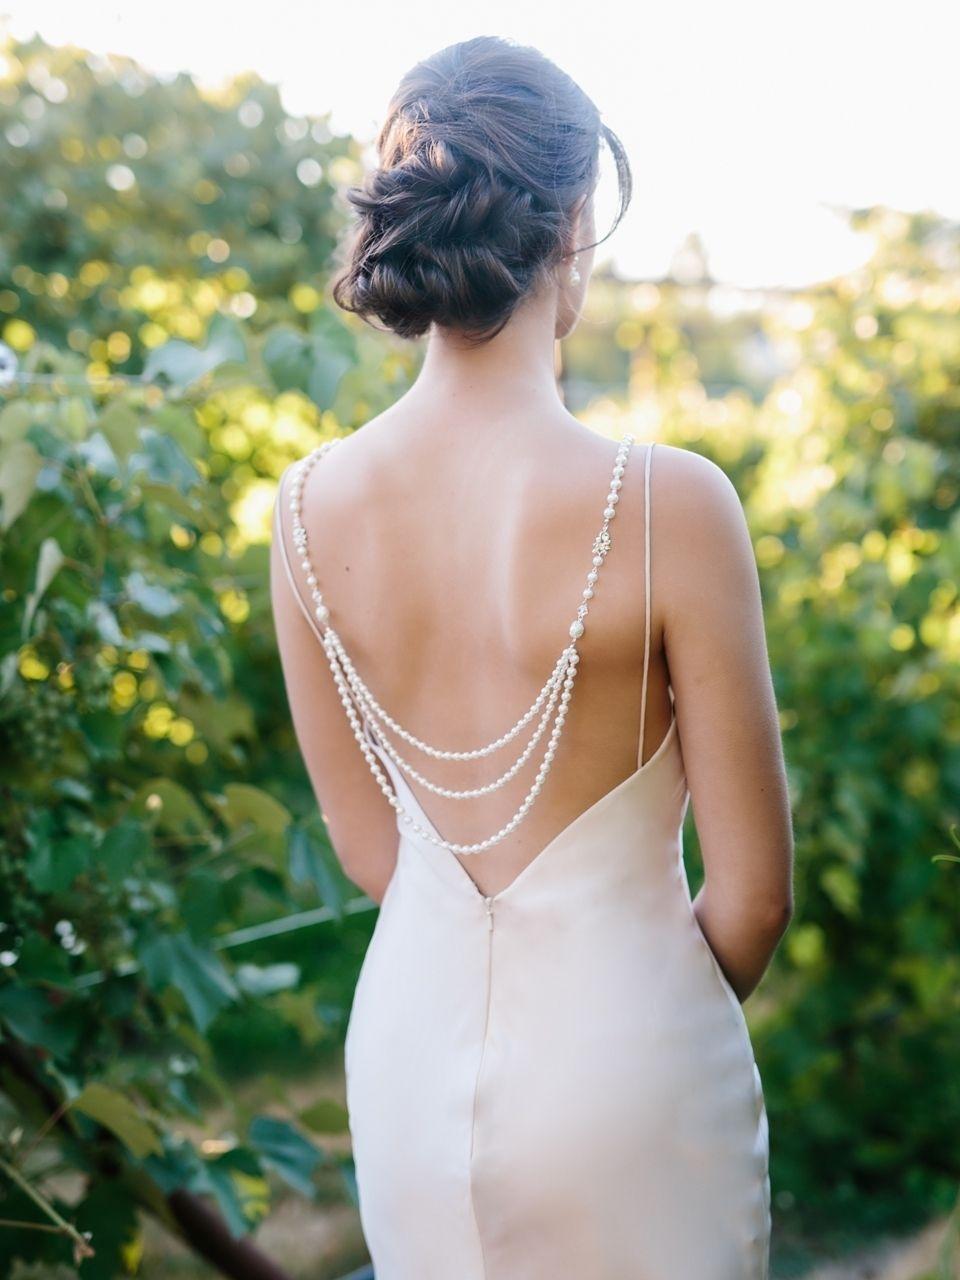 beaded drape accessories. backless dress drape Back drape dress adornment dress embellishment crystal drapes wedding dress drapes